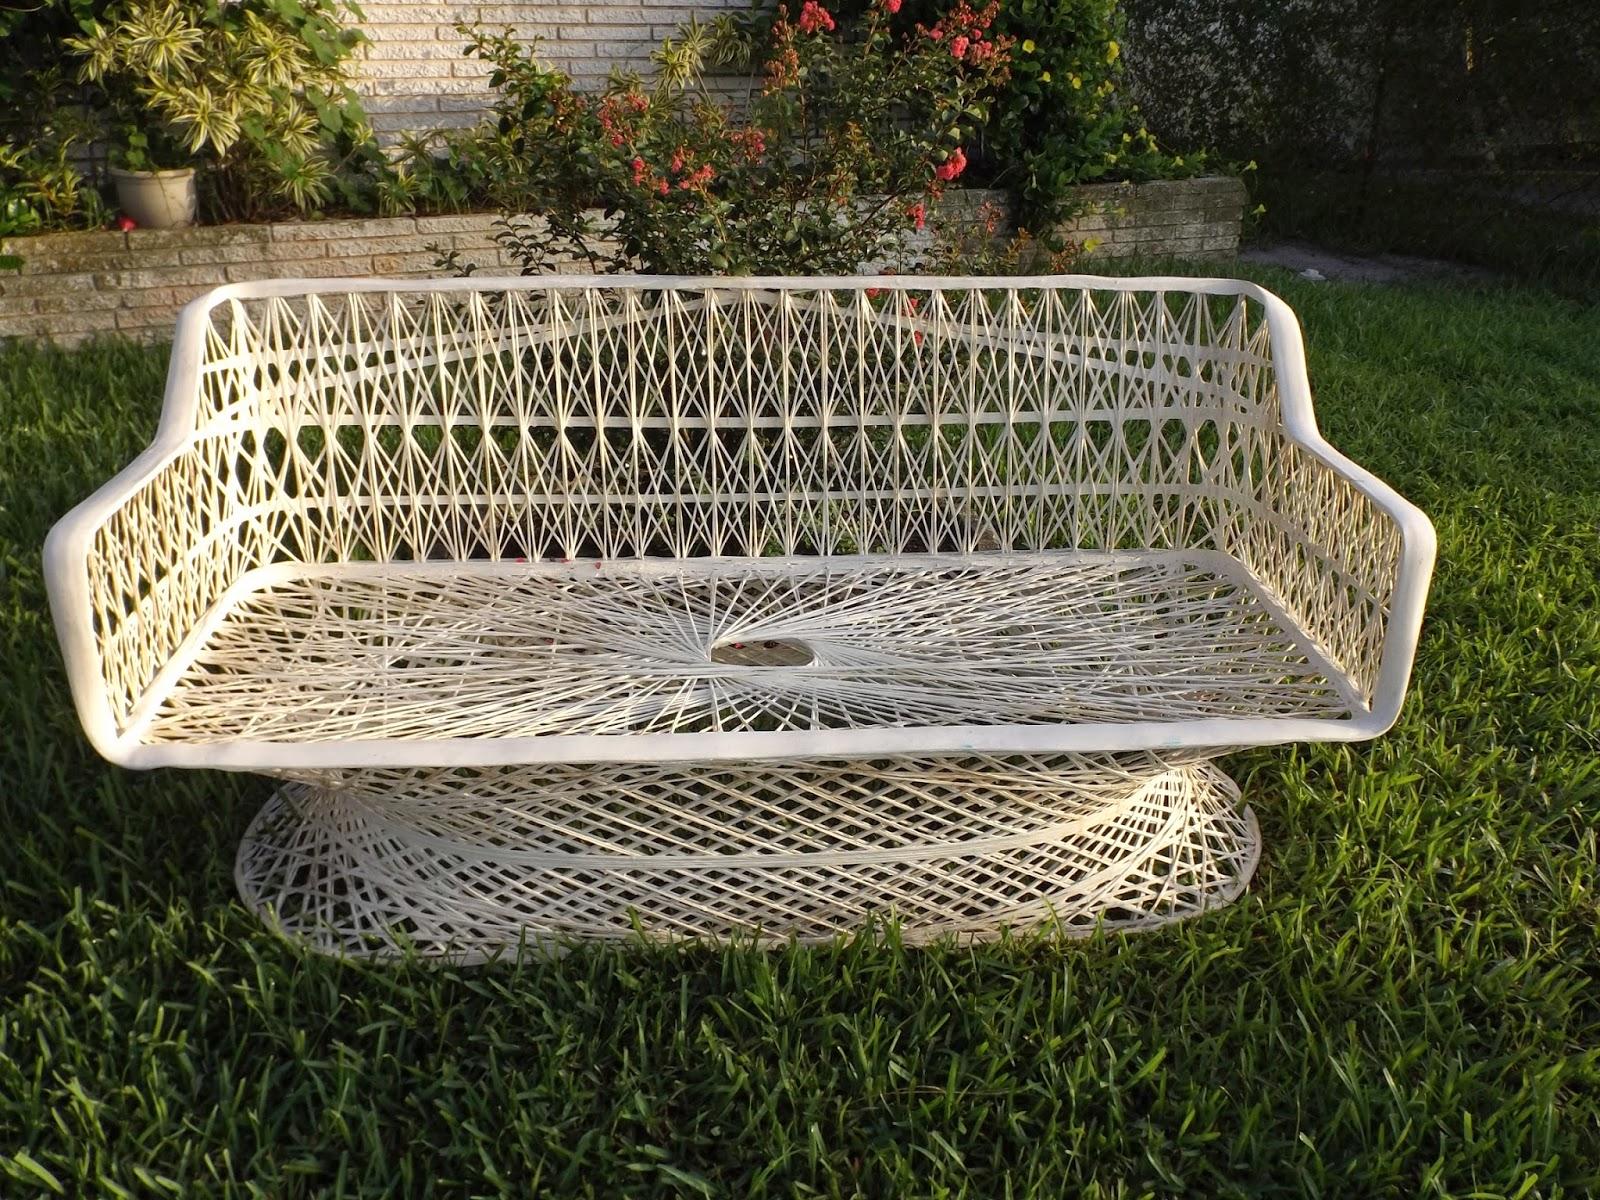 Vintage Rus Woodard Style Patio Chair Spun Fibergl Loveseat Sofa Settee Deck Furniture Mid Century Lawn Outdoor Seating